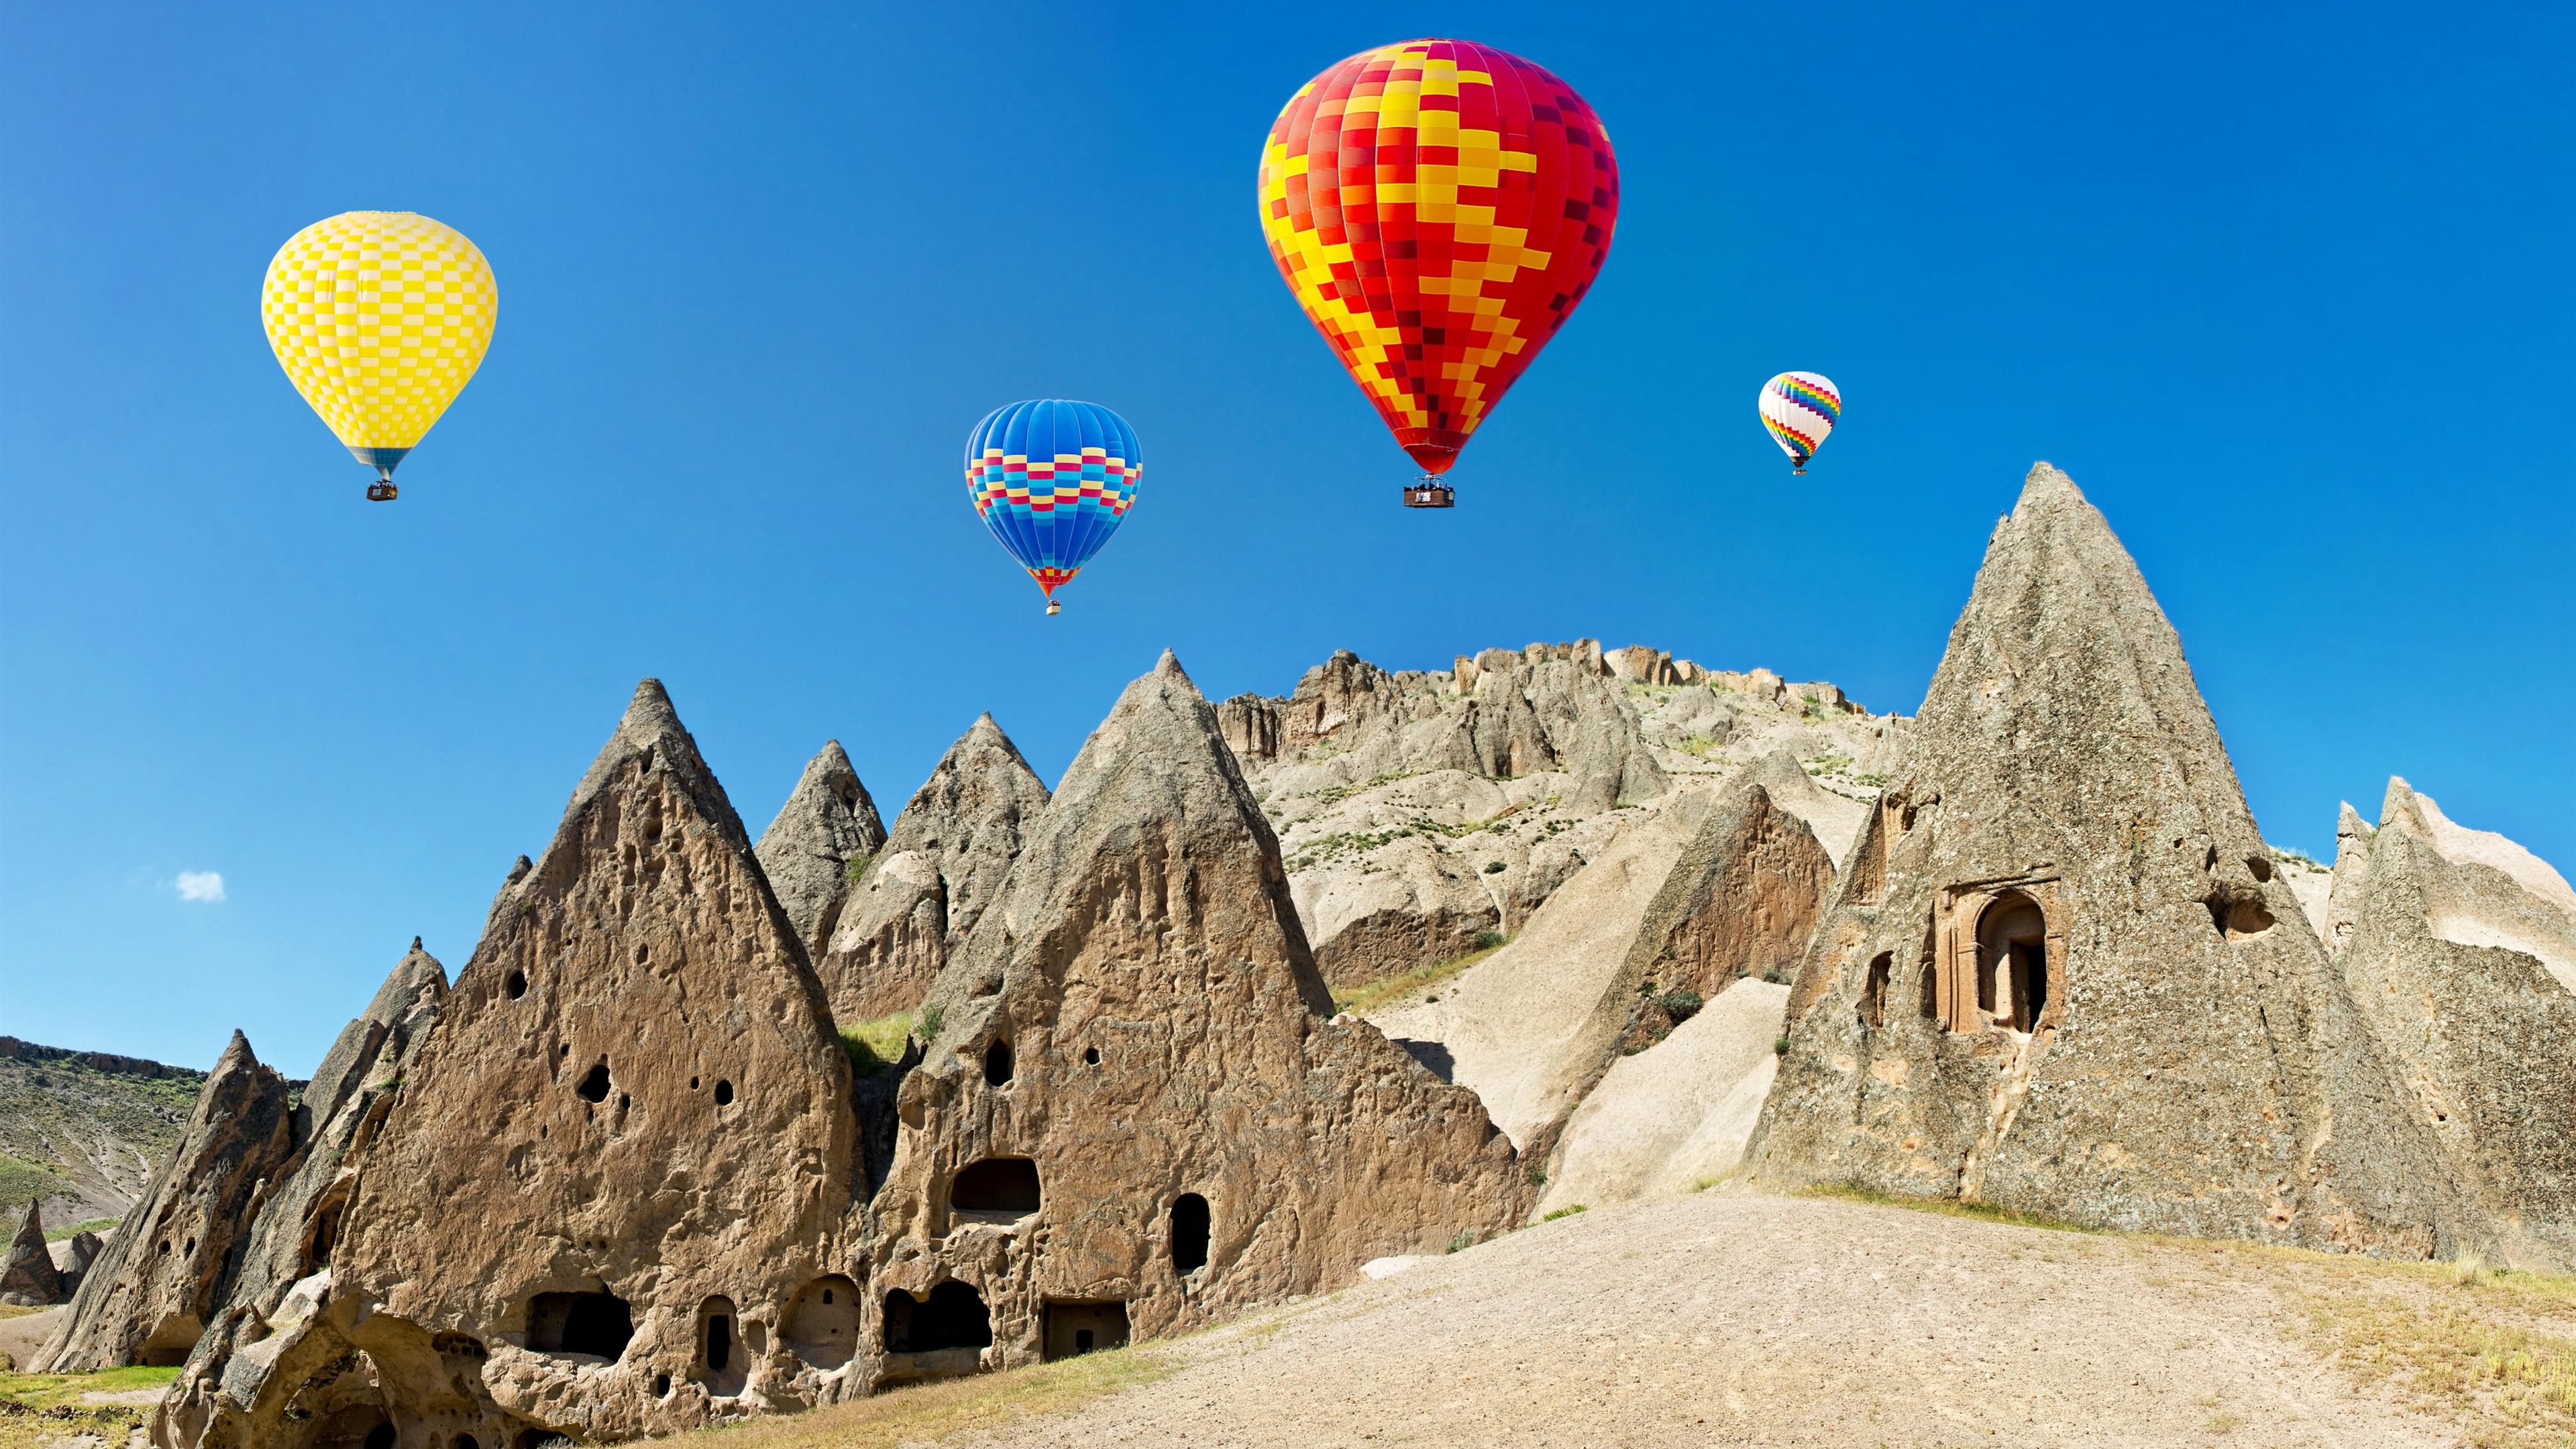 Wallpaper Hot Air Balloons Colorful Stones Turkey